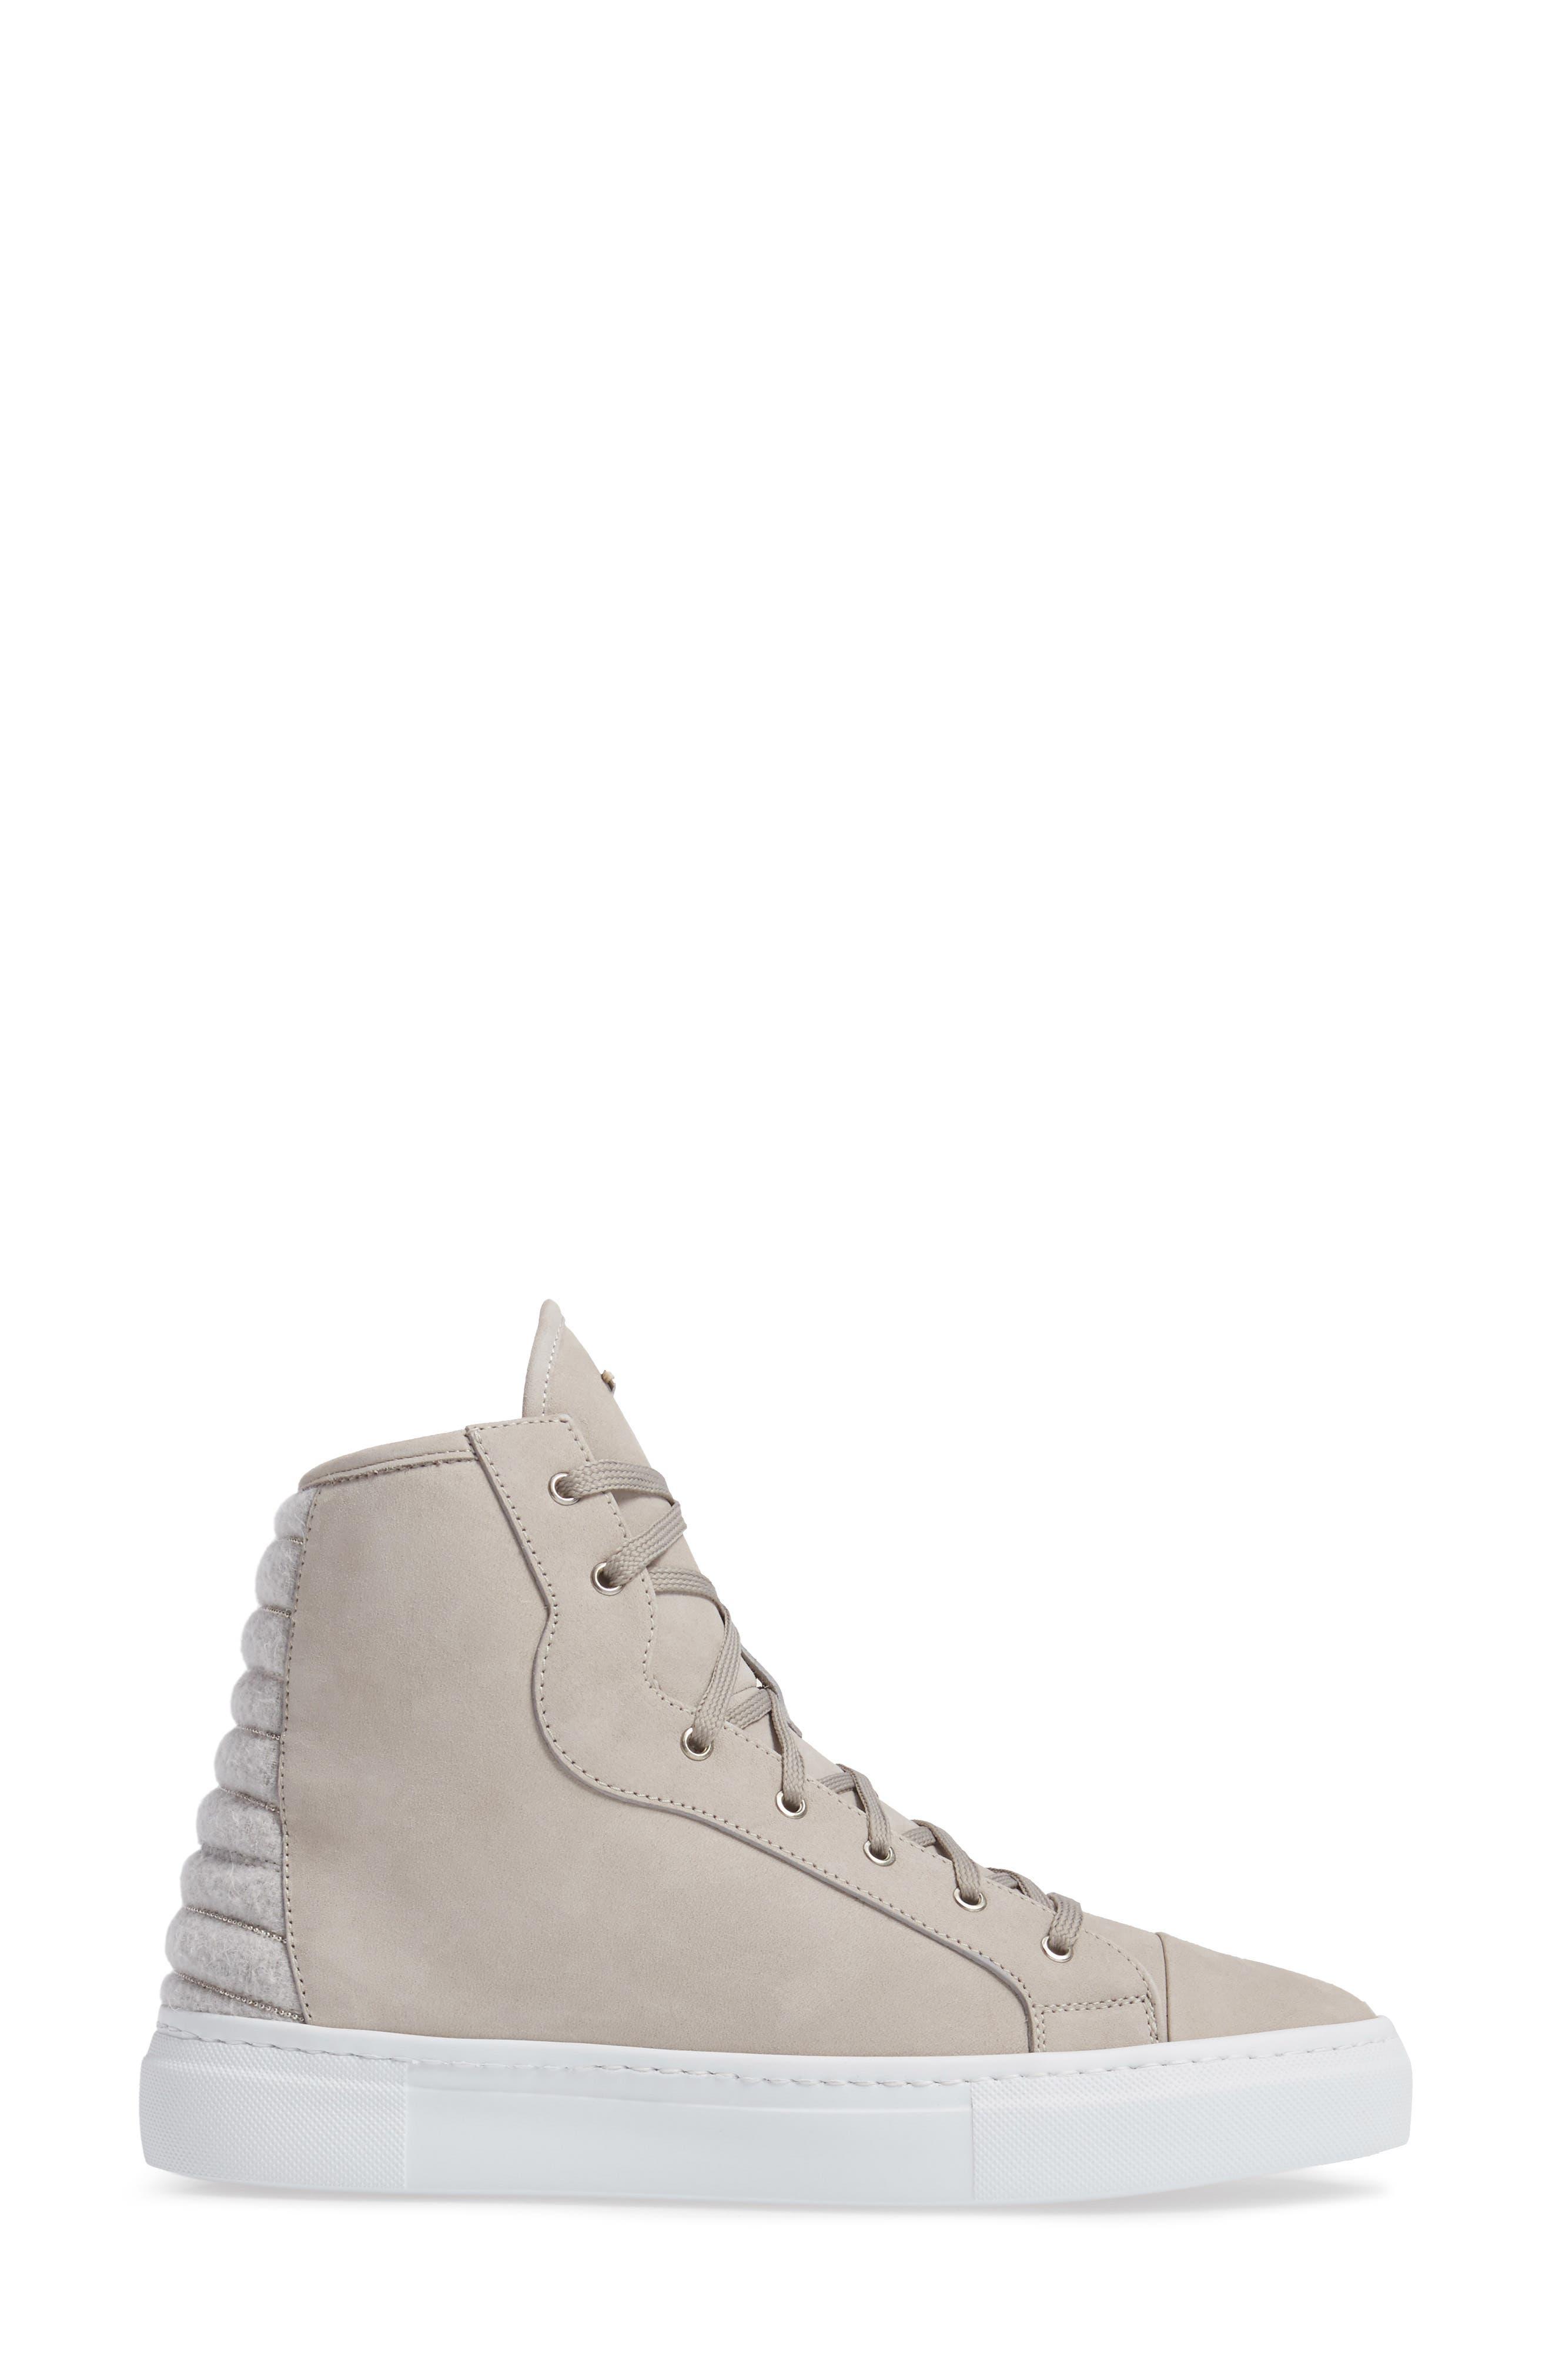 Eva High Top Sneaker,                             Alternate thumbnail 3, color,                             250